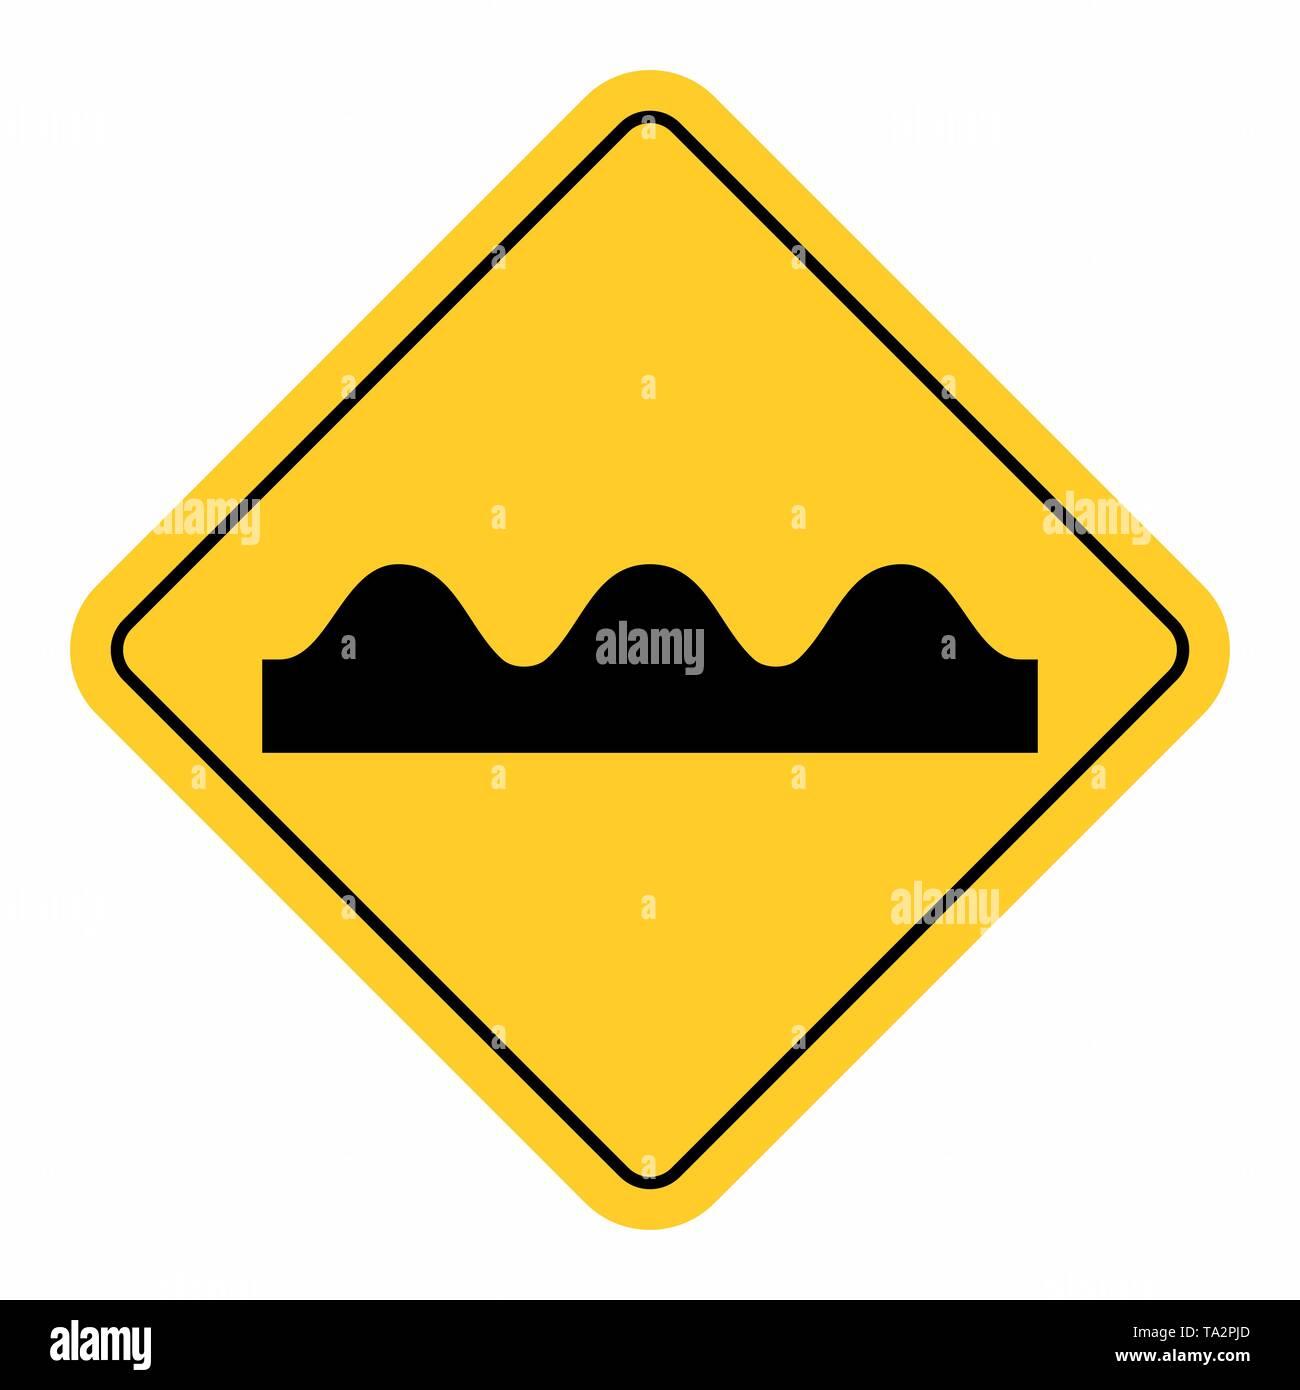 Bumpy Road Sign - Stock Image